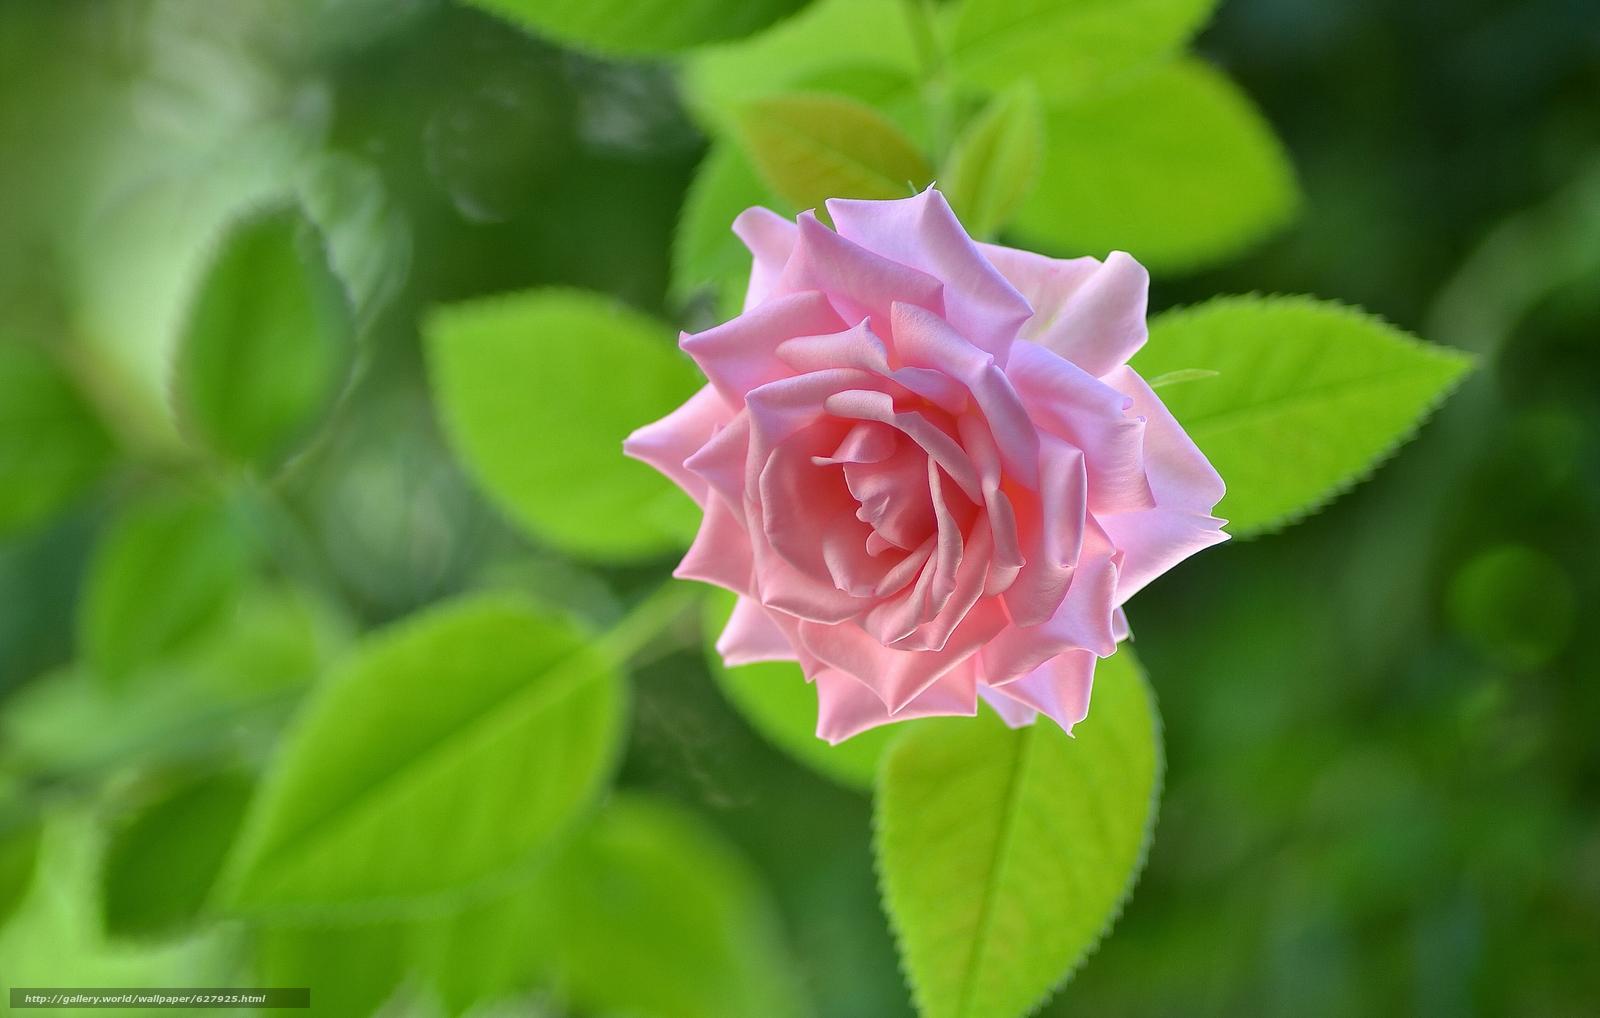 Скачать на телефон обои фото картинку на тему роза, бутон, макро, разширение 3456x2199